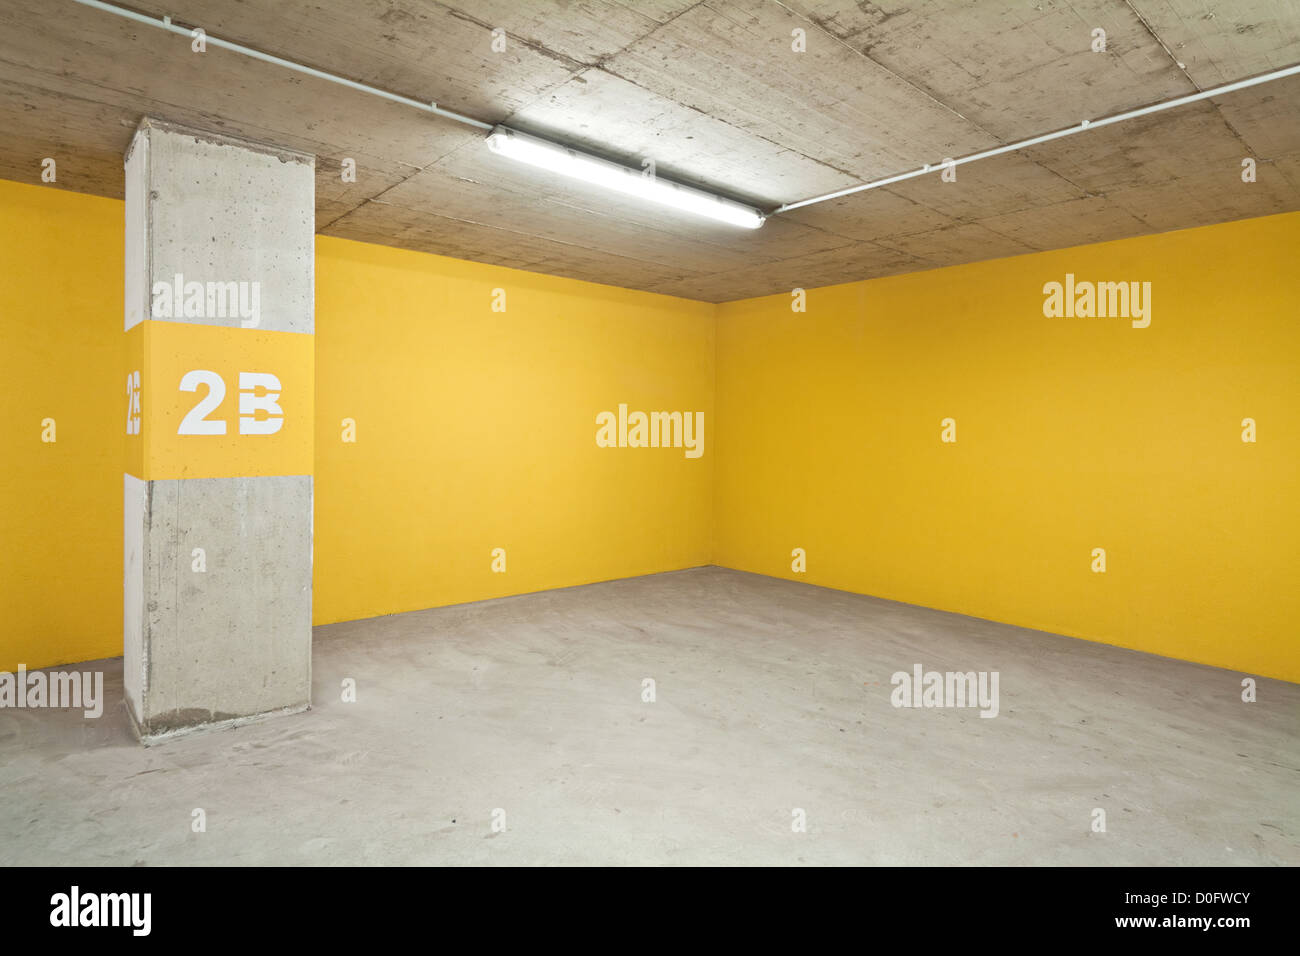 Empty underground parking lot area - Stock Image